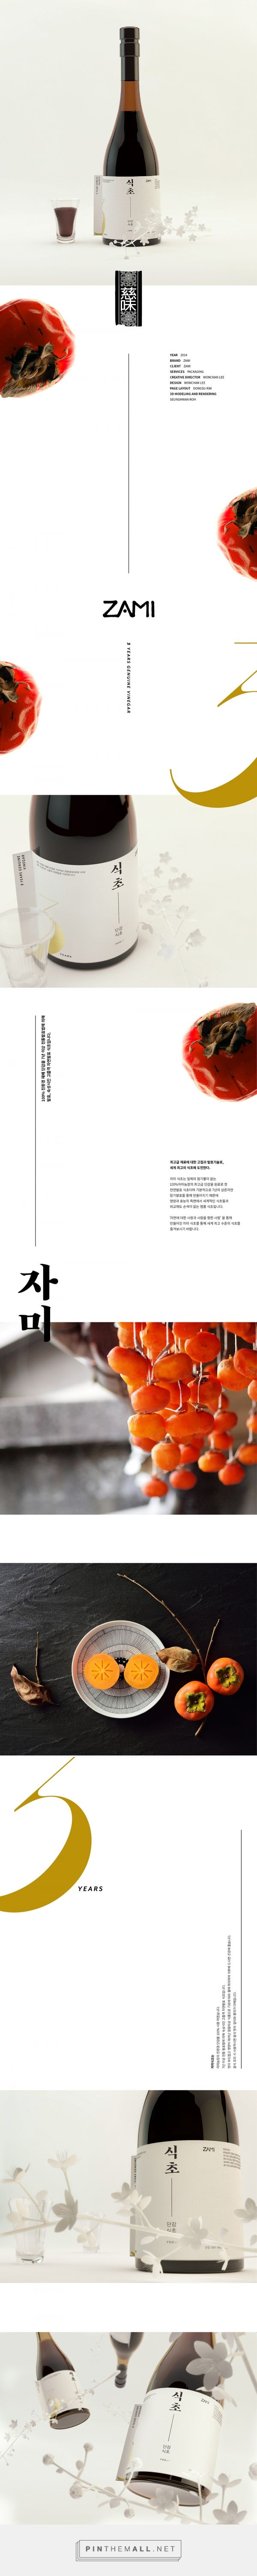 ZAMI Vinegar Packaging on Behance by Minimlist Seoul, Korea, Republic of curated by Packaging Diva PD. ZAMI Genuine Vinegar Packaging © Art direction, branding, industrial design.